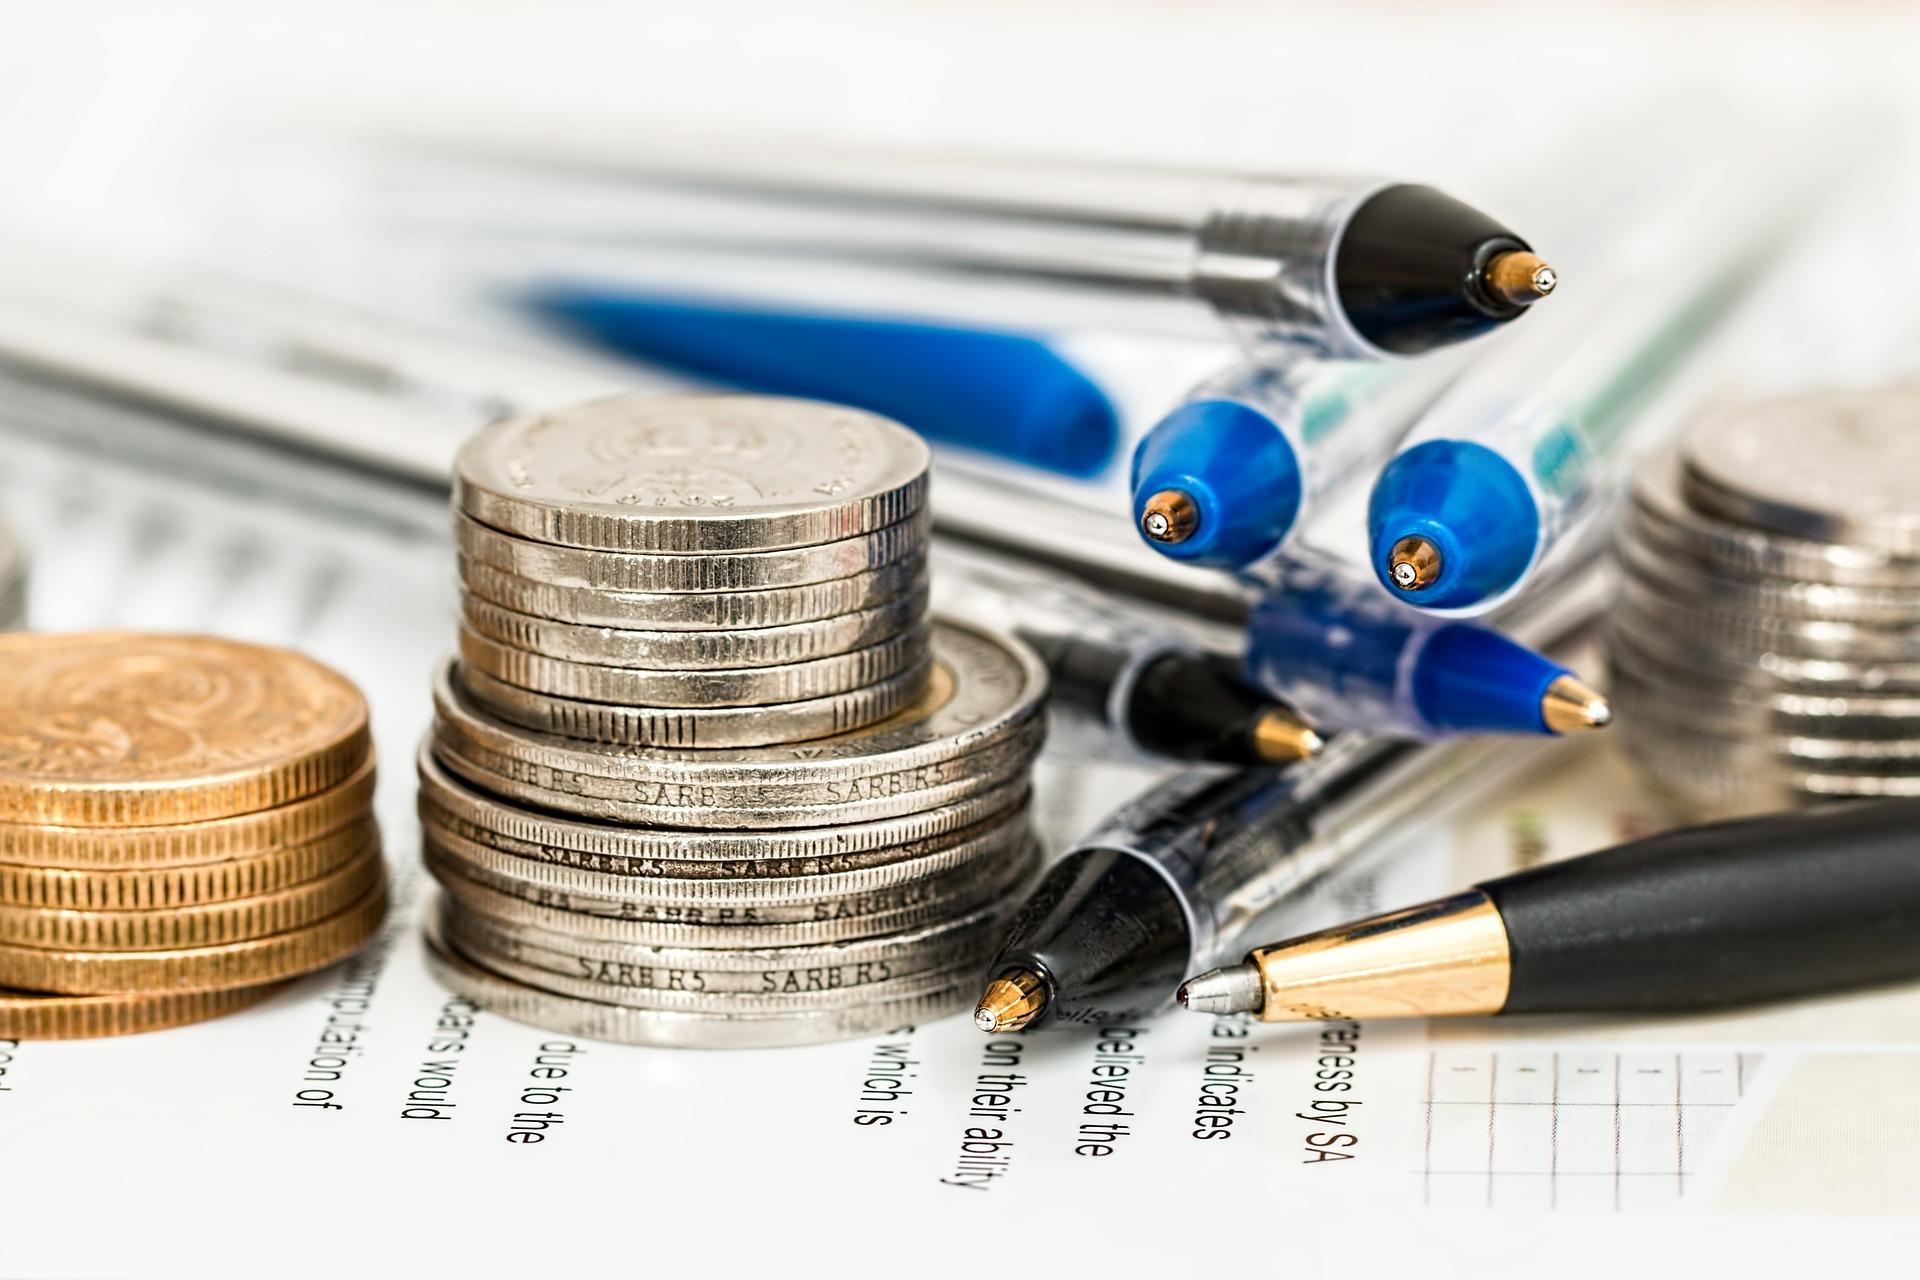 Penge pension bidrag skat regnskab